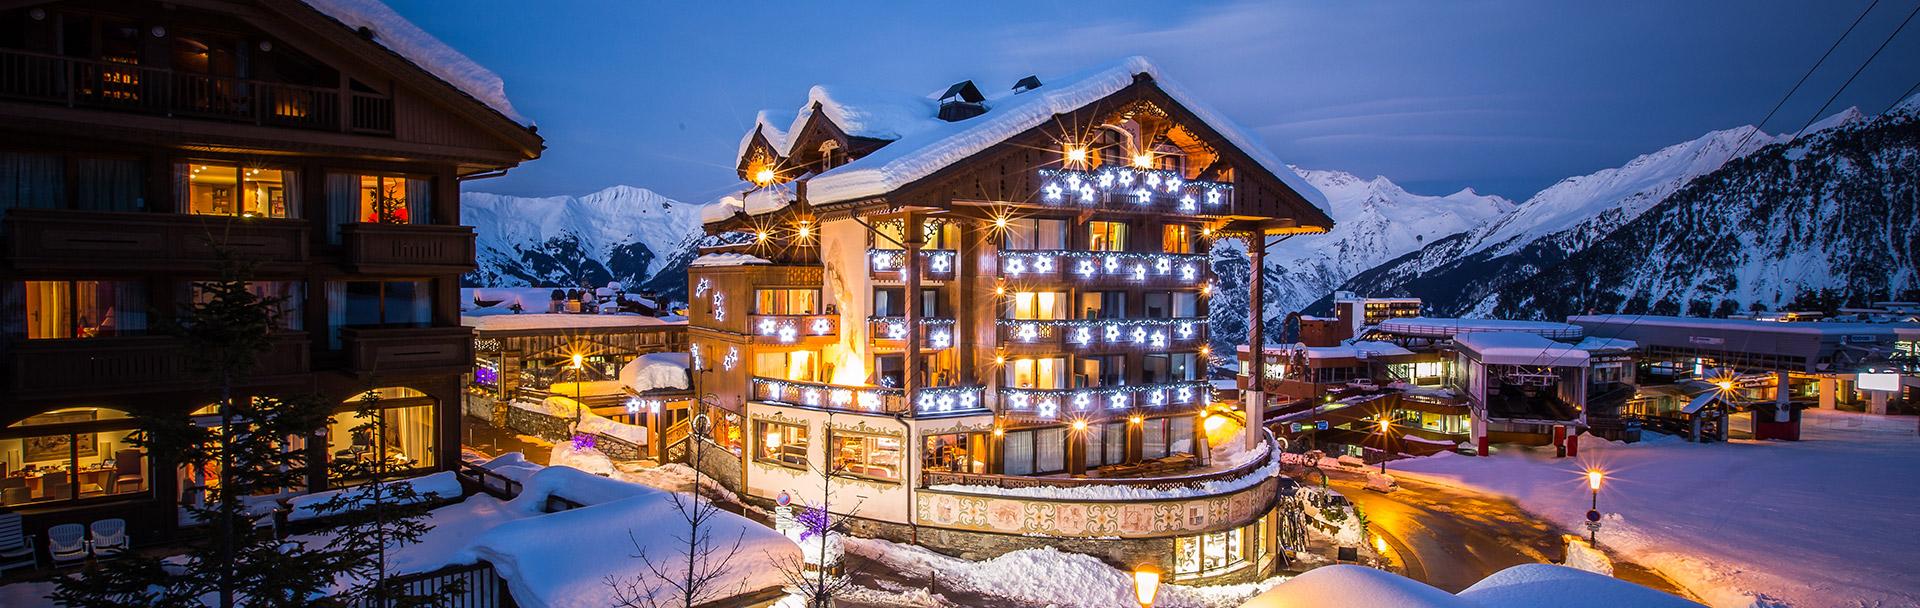 Hôtel en montagne